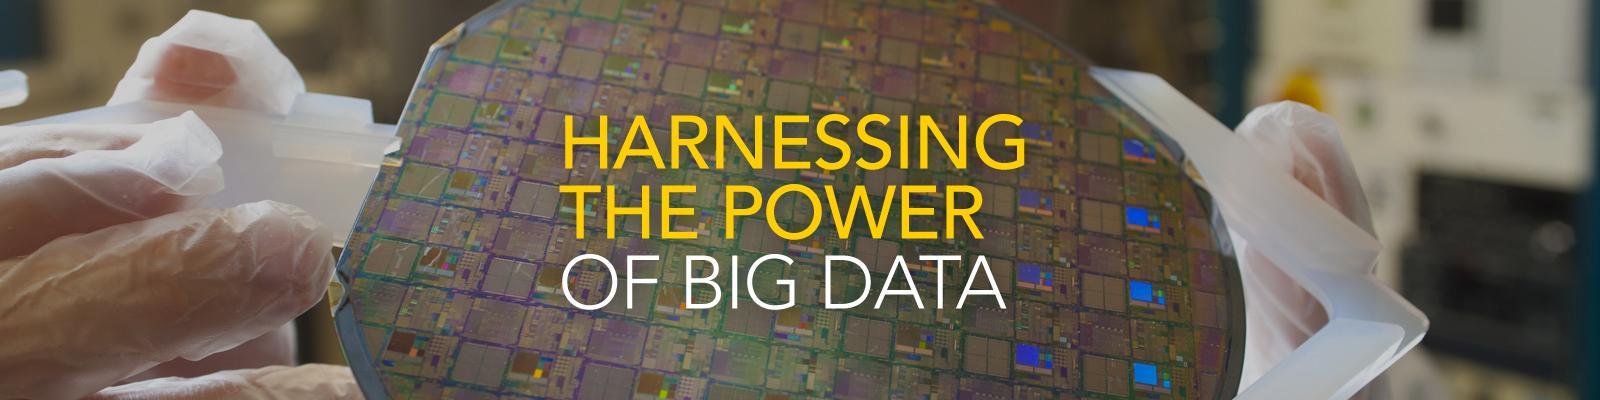 ECE Big Data